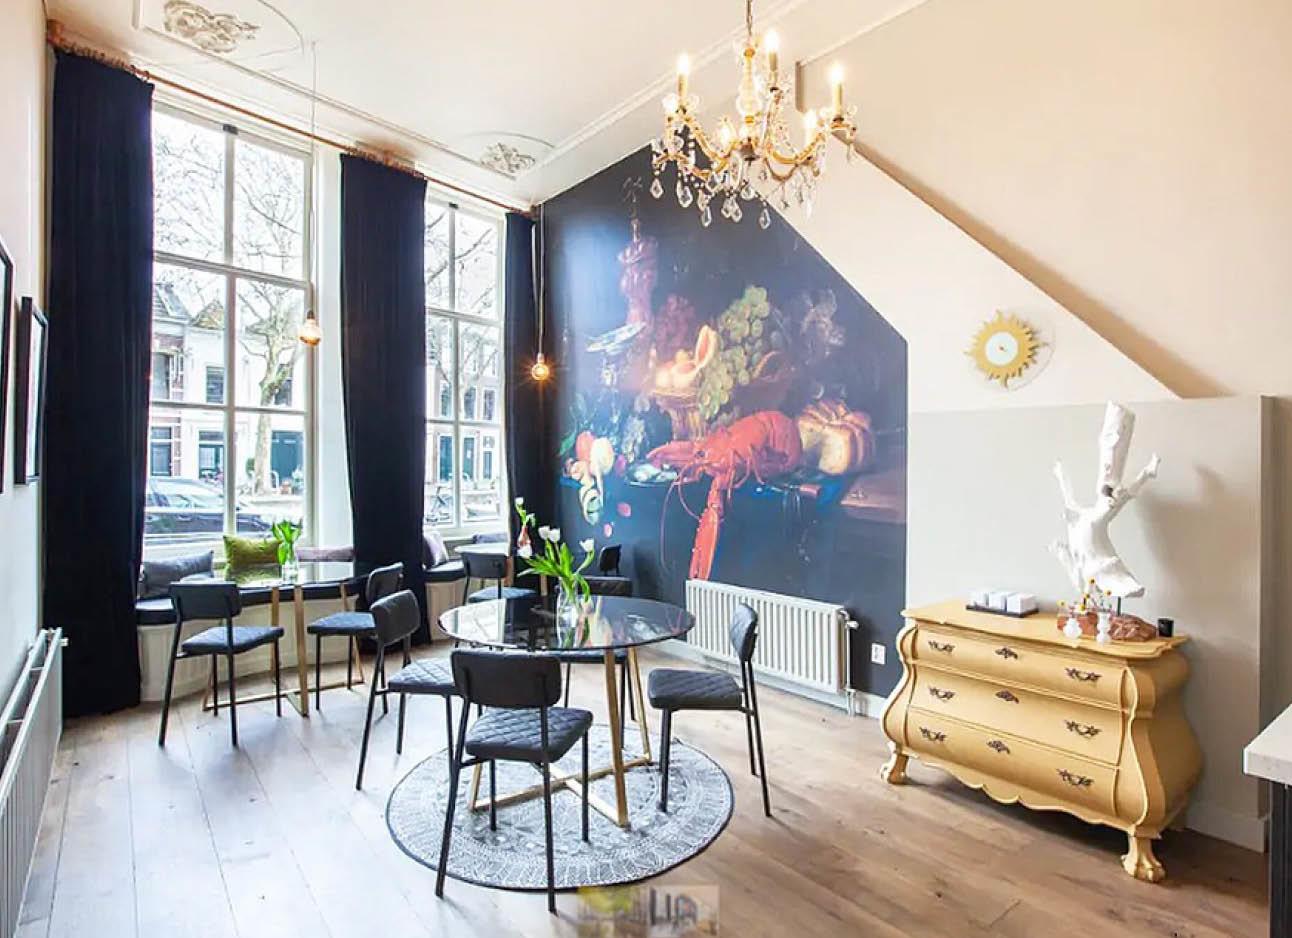 airbnb met mooi plafond